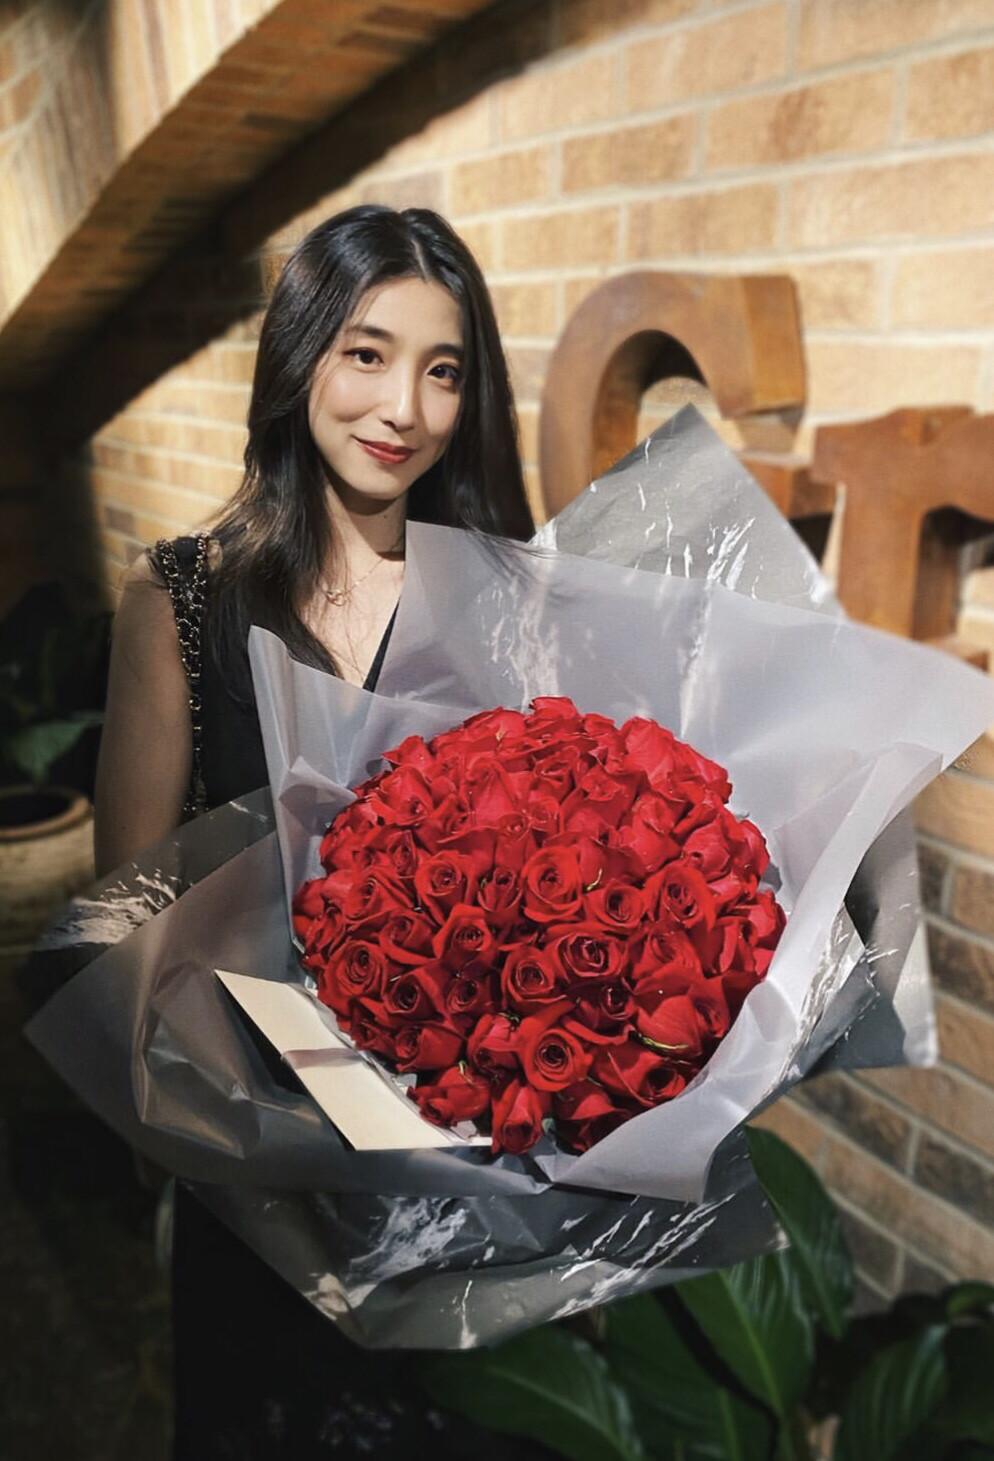 Signature Wrapped Arrangement (4 Dozen Roses)